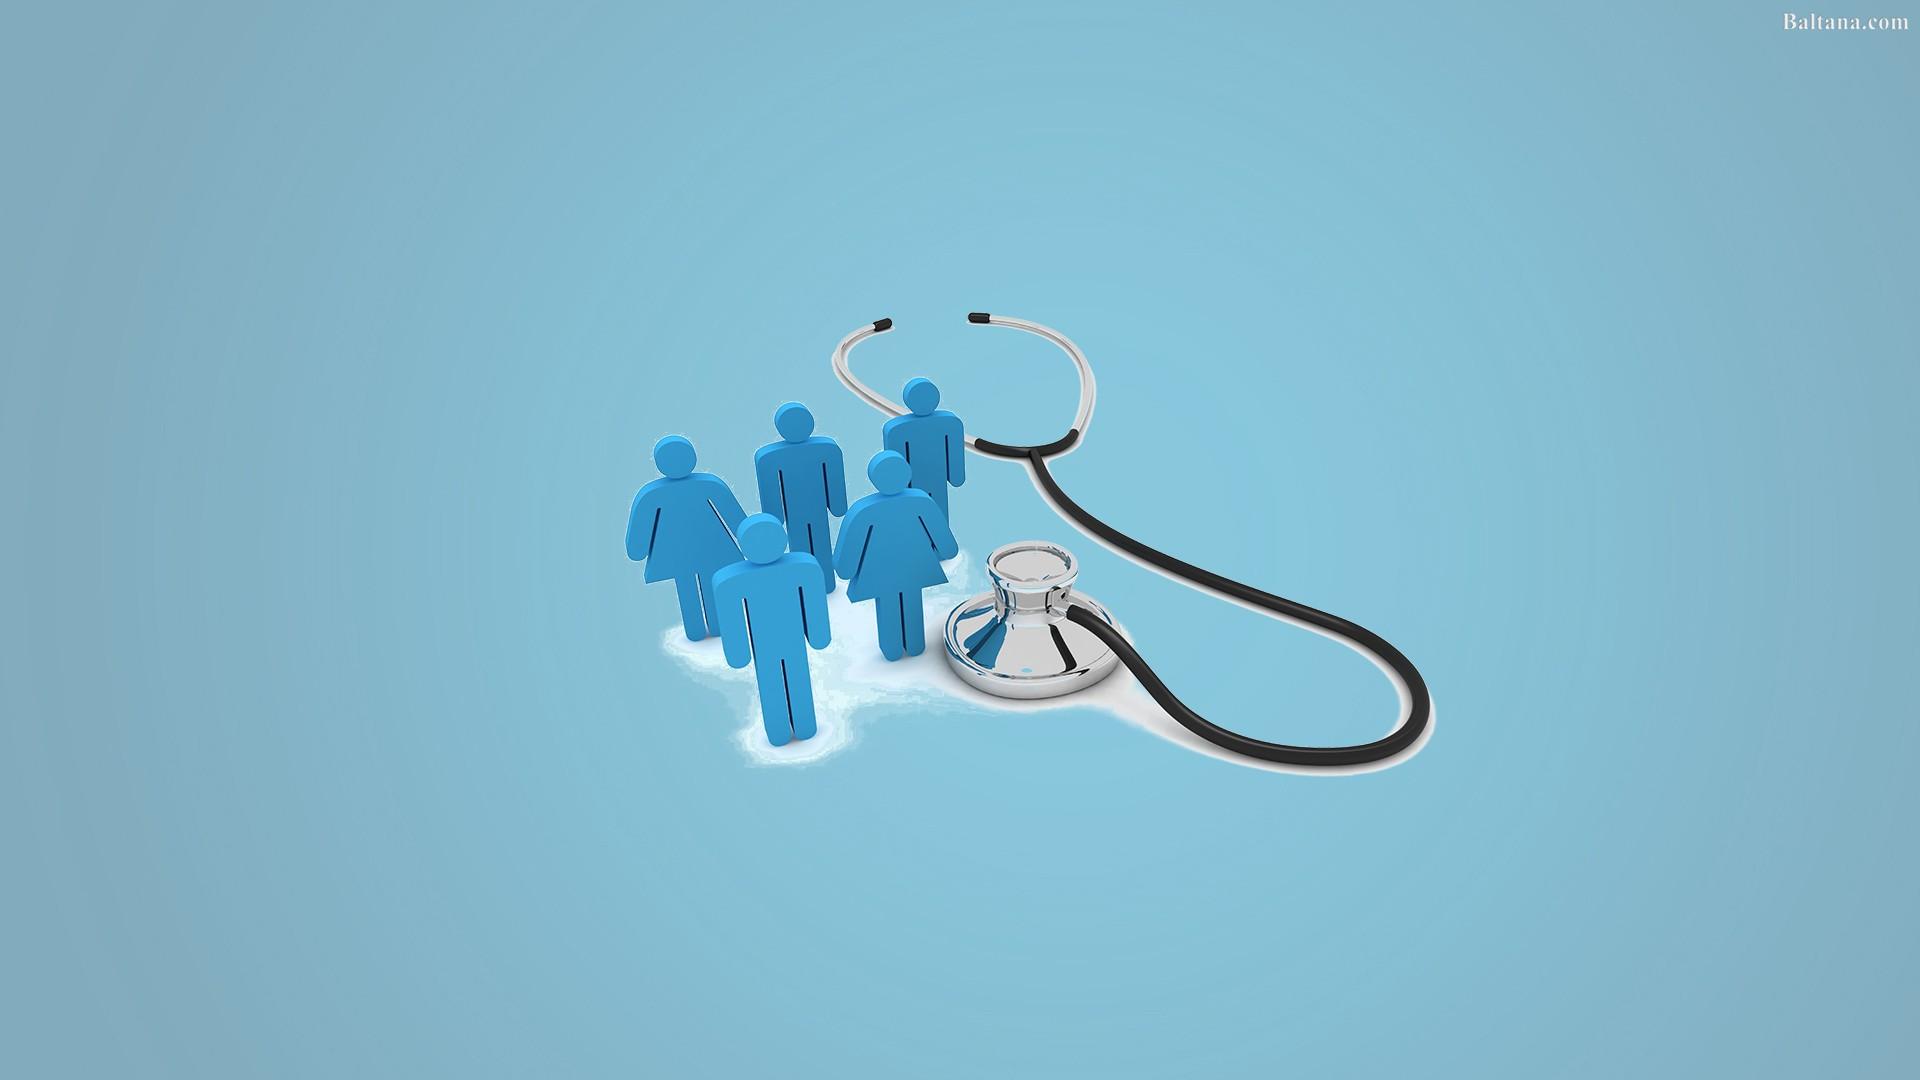 Health HD Wallpaper 29843   Baltana 1920x1080